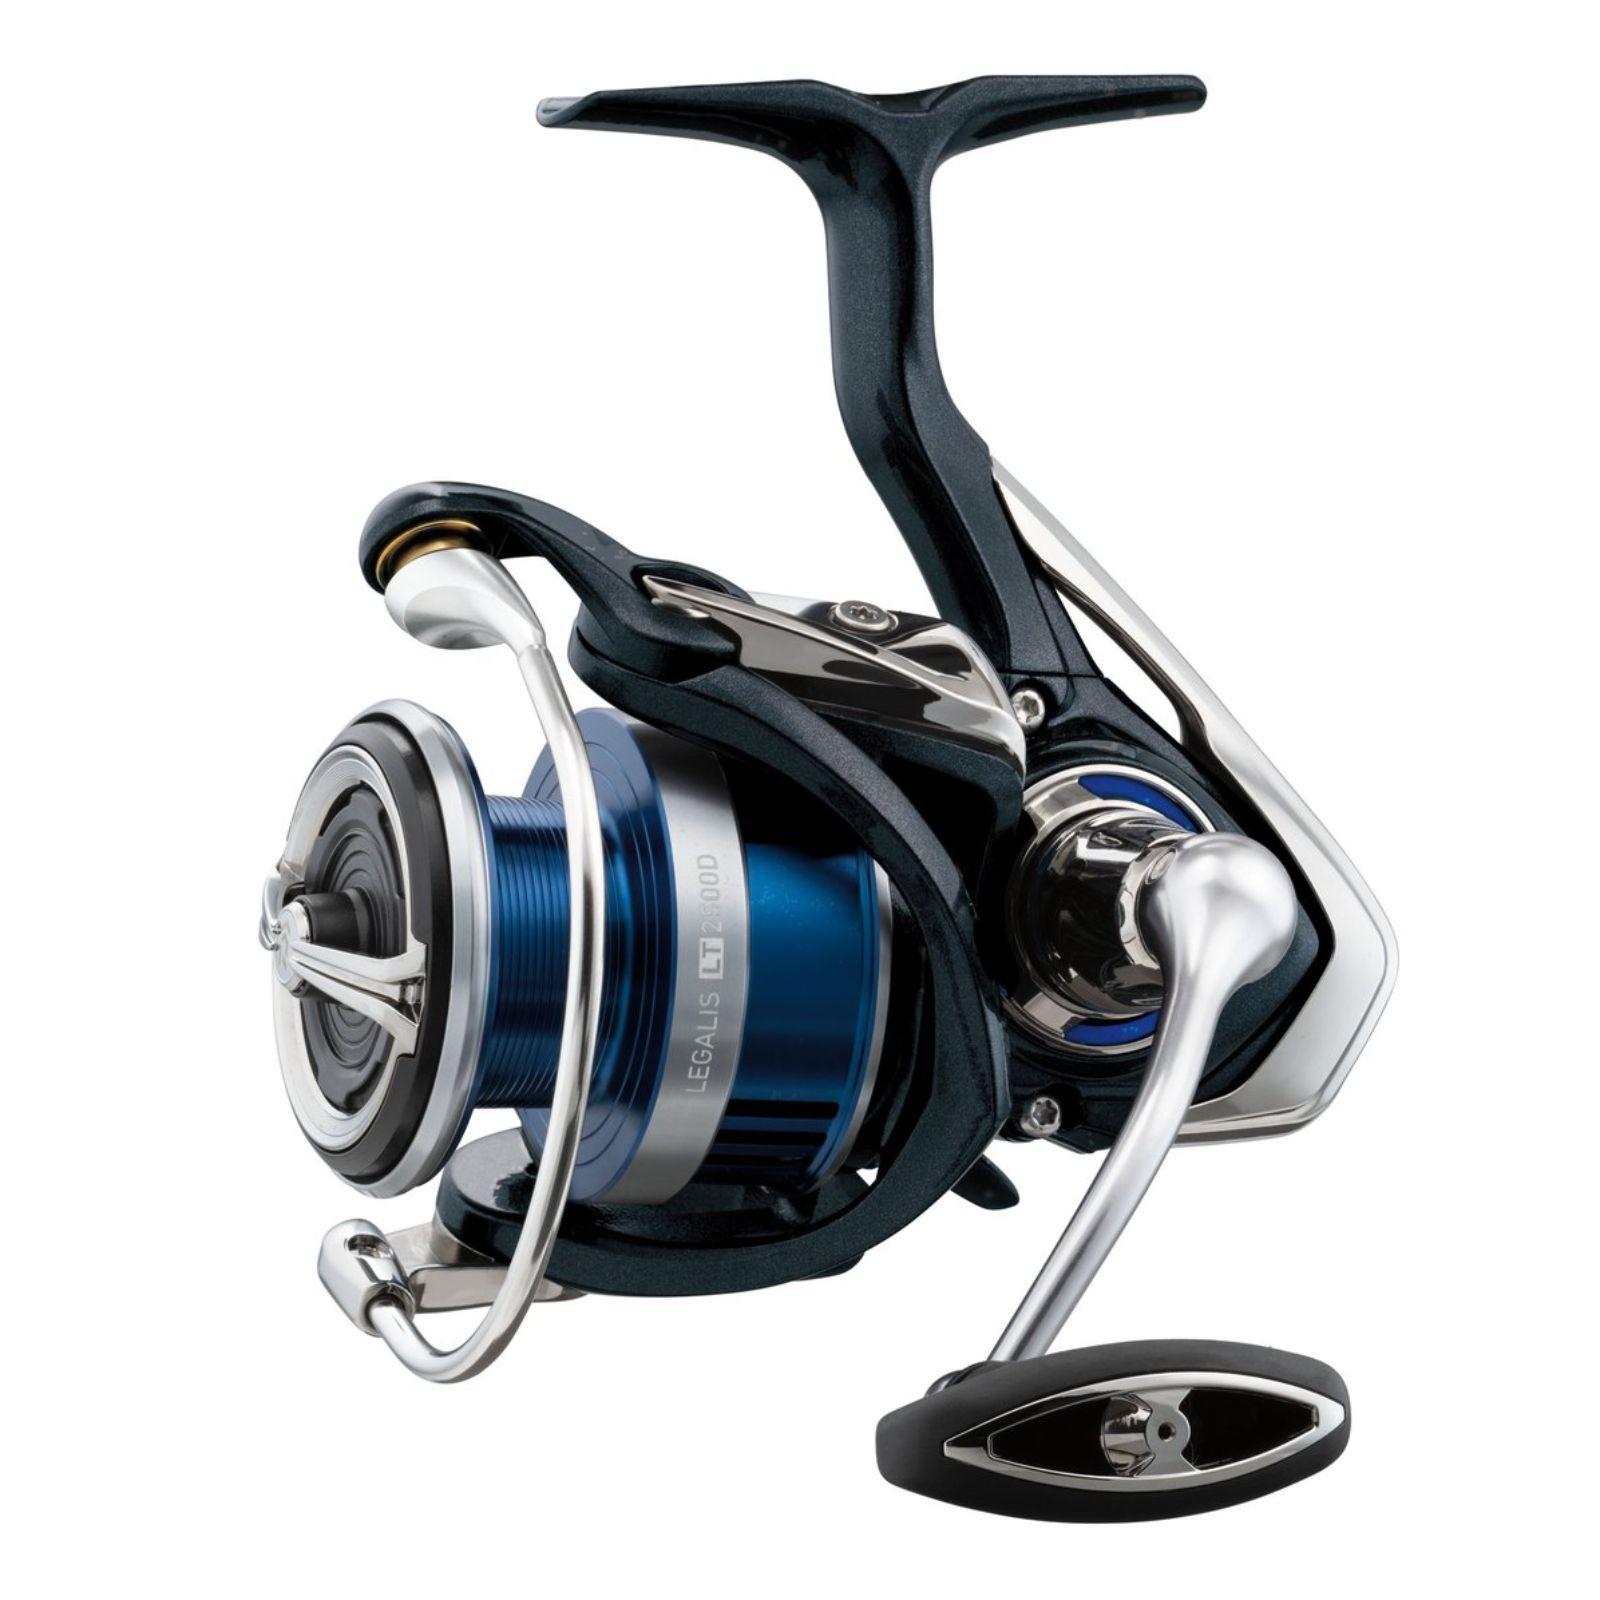 Daiwa Legalis LT 2500D-XL Spinning Reel